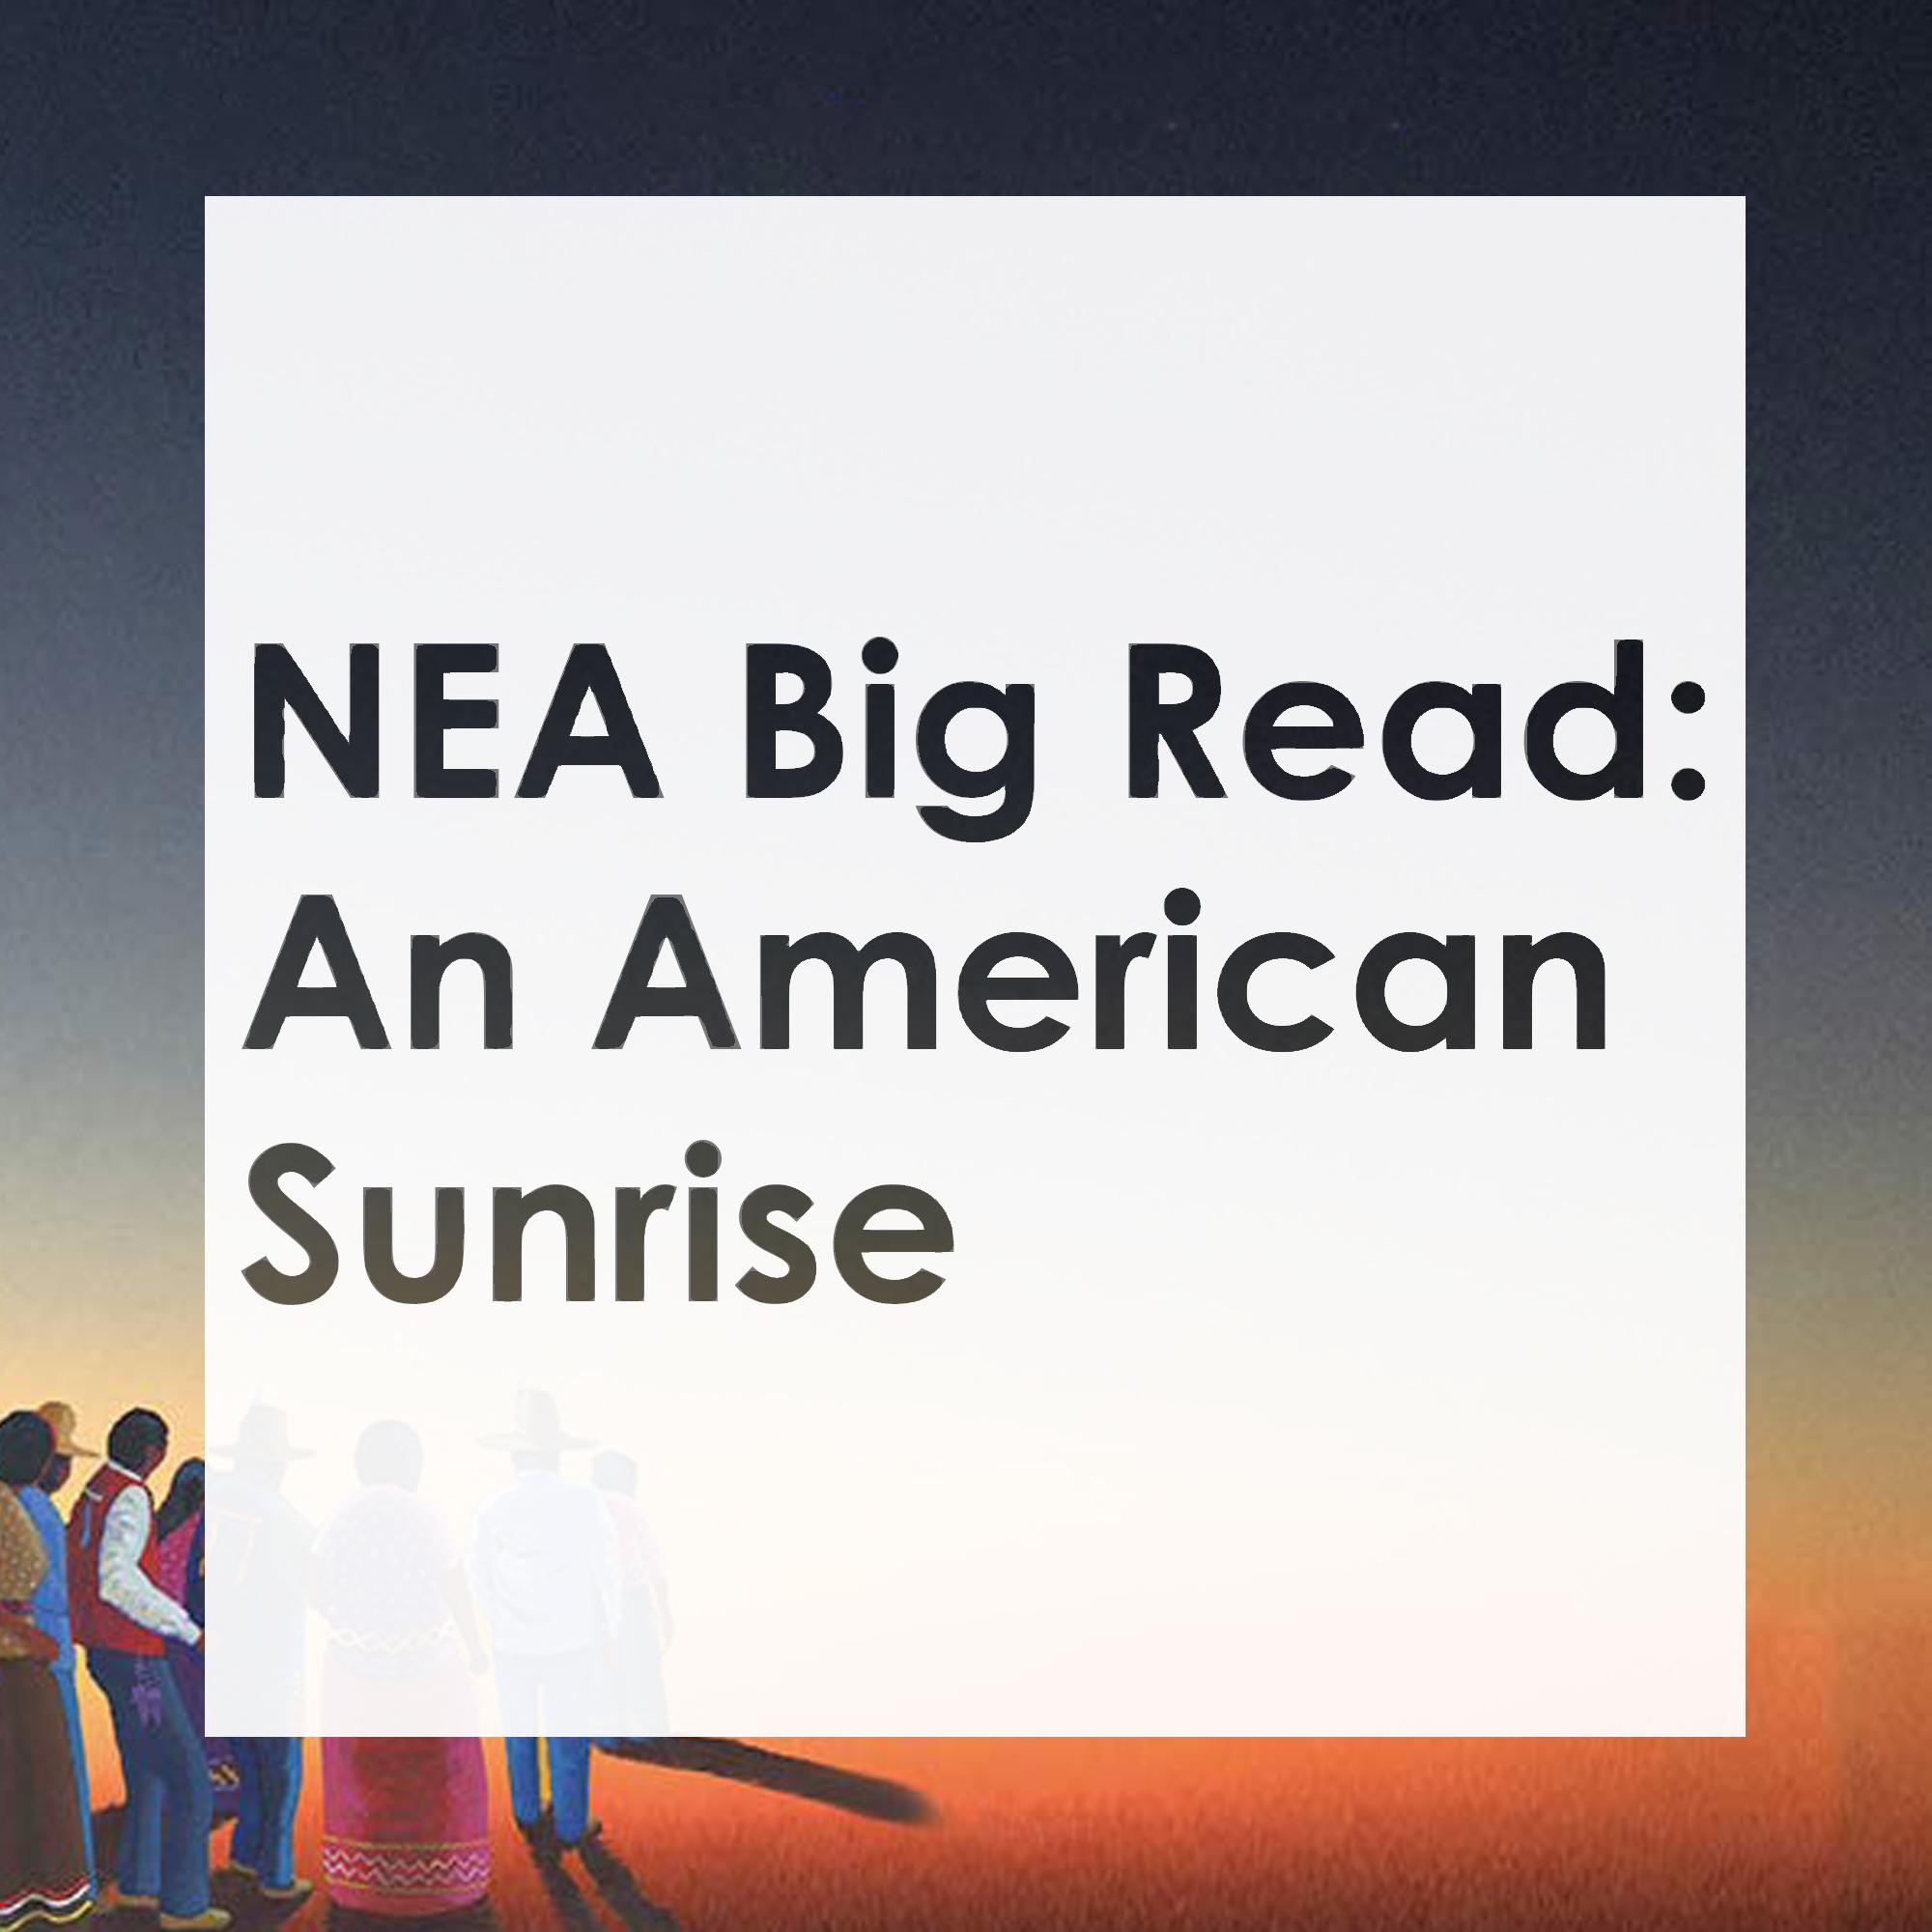 NEA Big Read Book Discussion: An American Sunrise by Joy Harjo